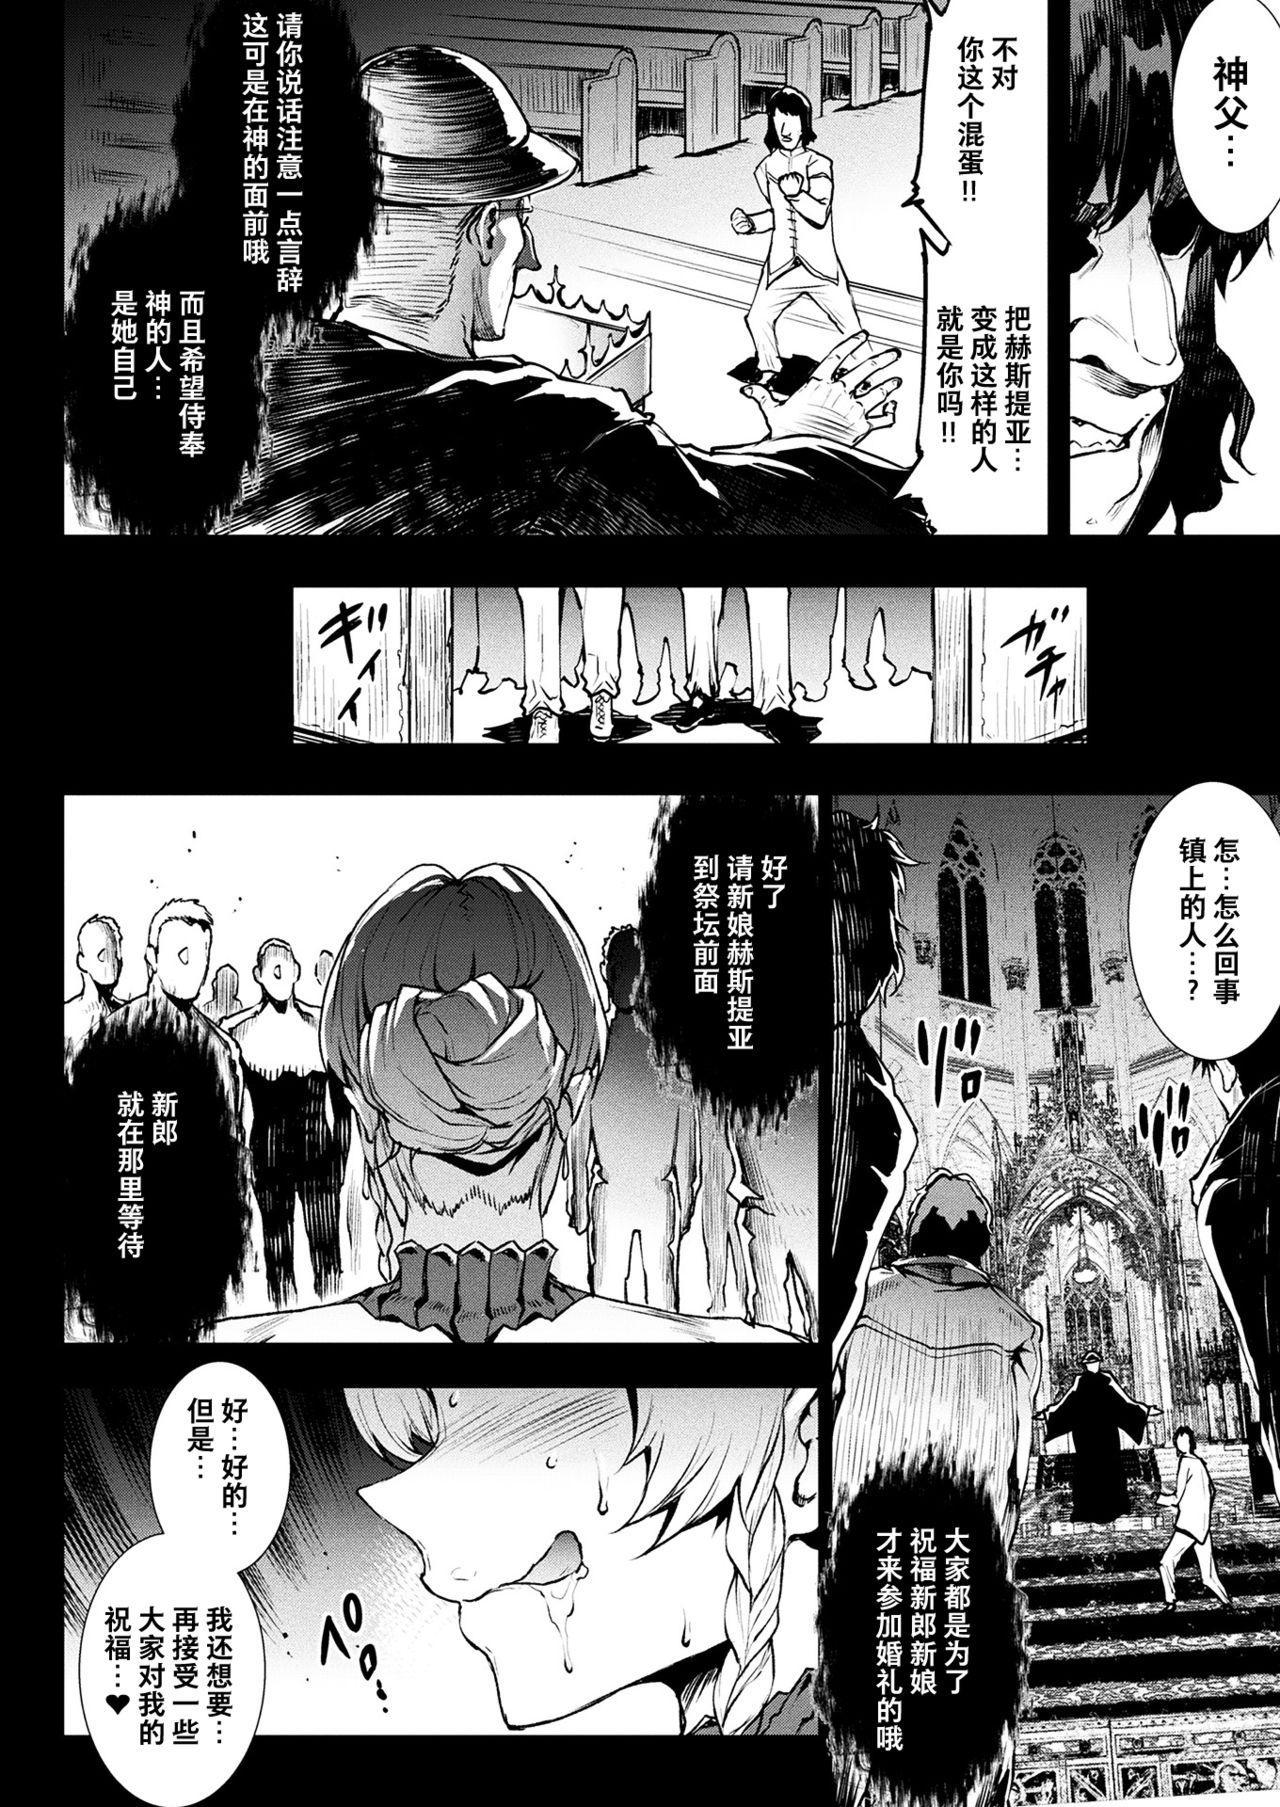 [Erect Sawaru] Raikou Shinki Igis Magia -PANDRA saga 3rd ignition- Ch. 24 (COMIC Unreal 2020-08 Vol. 86) [Chinese] [不咕鸟汉化组] [Digital] 5